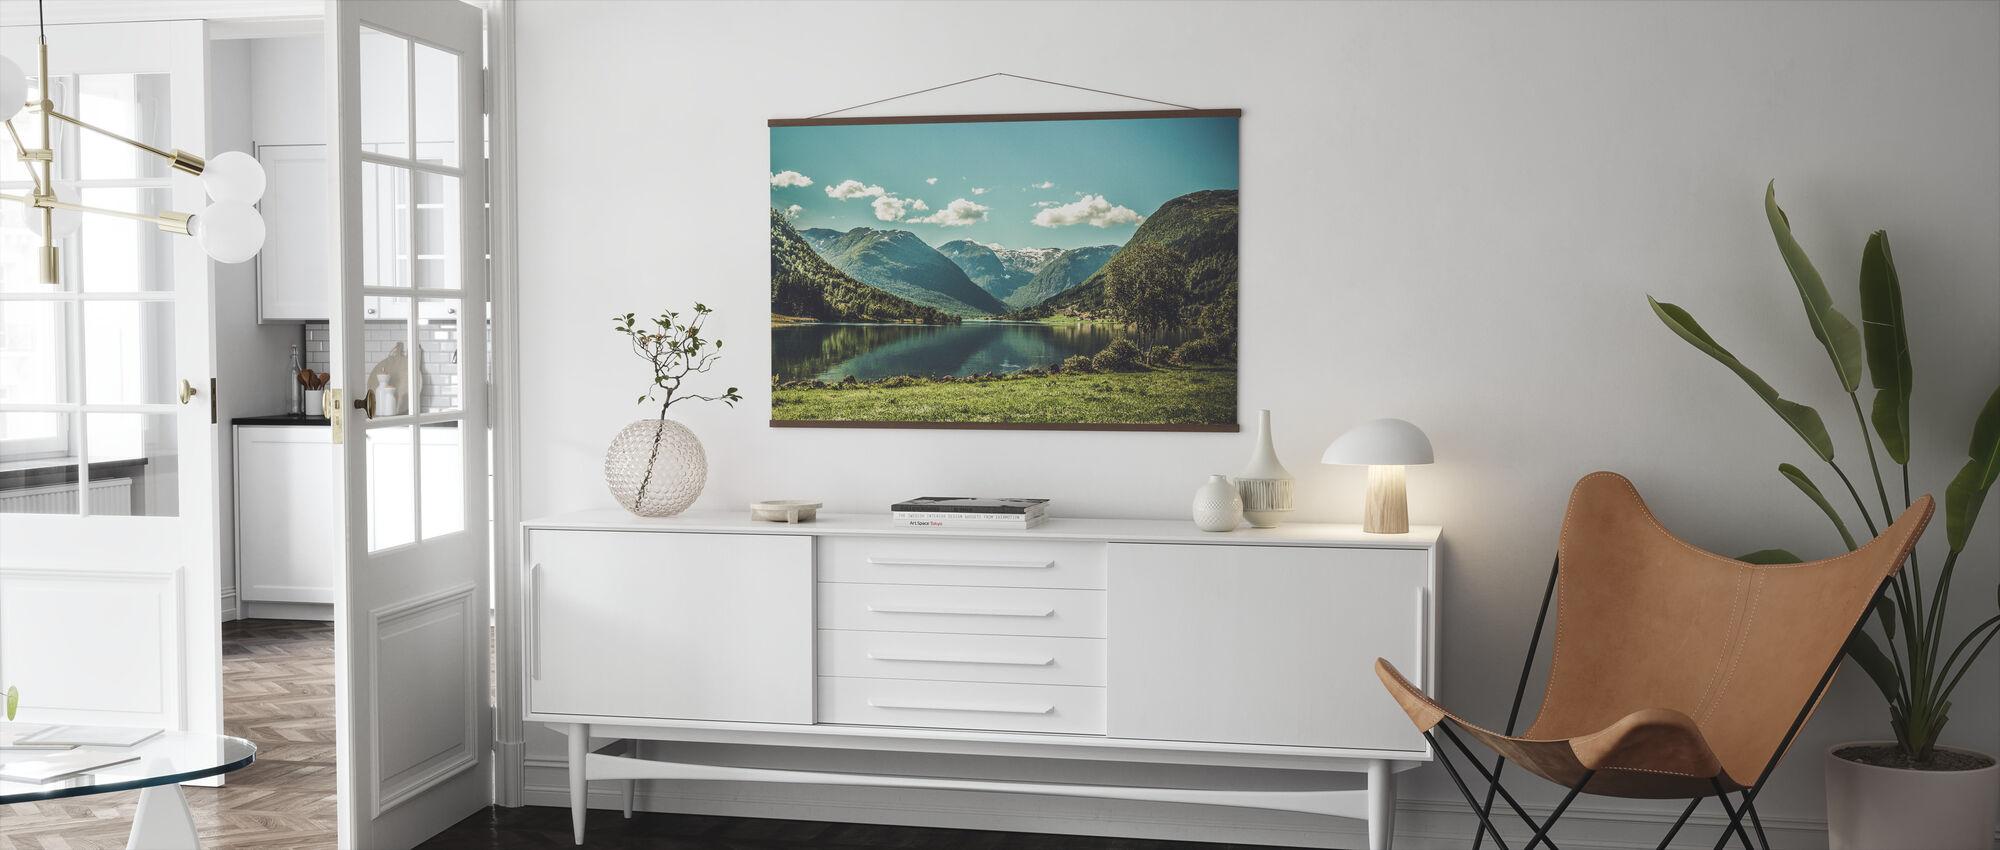 Landskap i Norge - Plakat - Stue